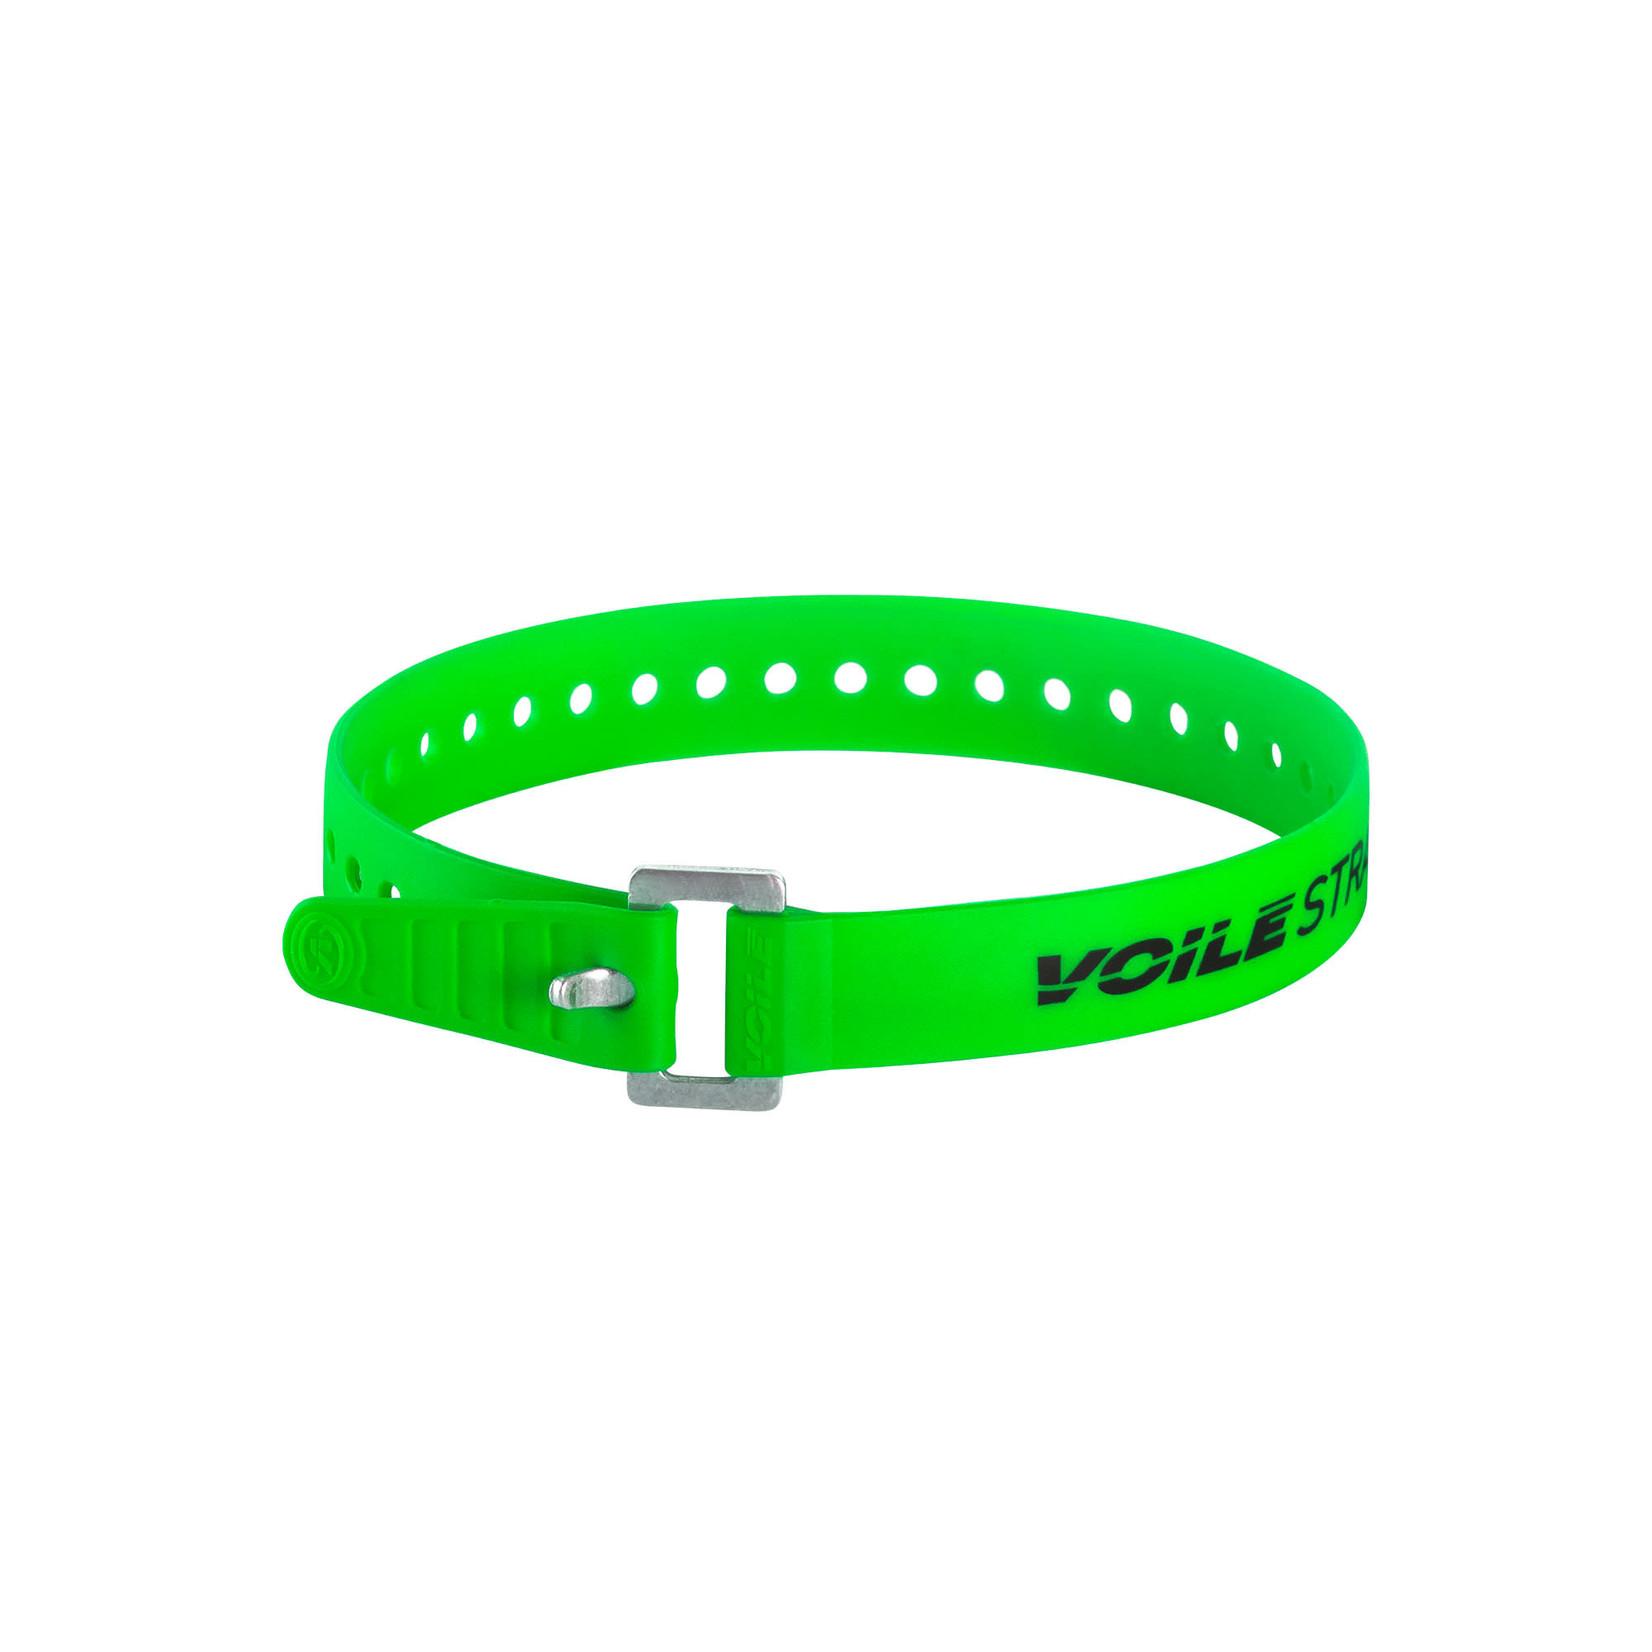 "Voile Voile Straps® XL Series Aluminum Buckle — 32"" Green"